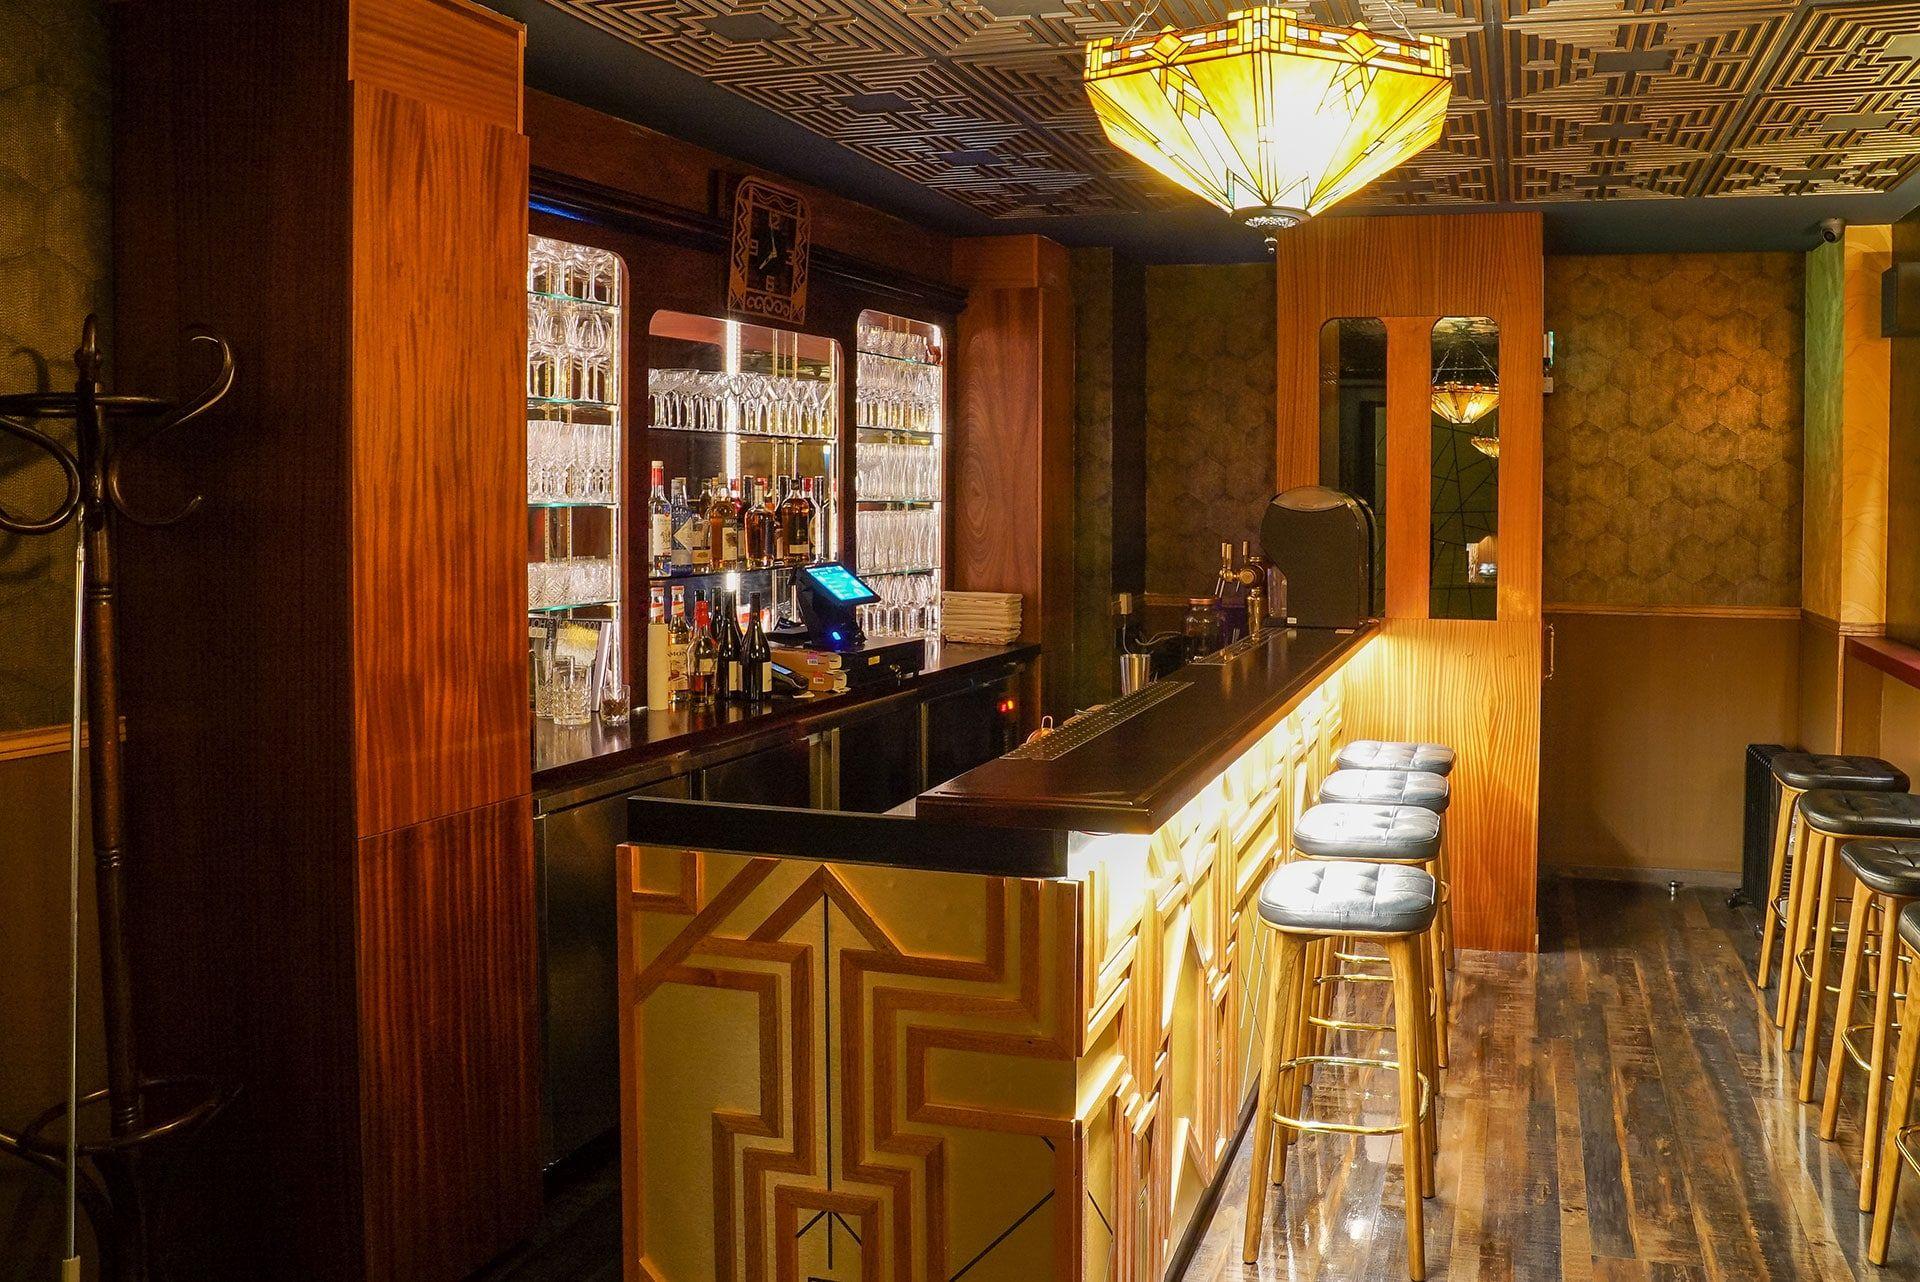 Mobster Bar Bar Circus Agencement Inox En 2020 Travaux De Maconnerie Piste De Danse Barmans